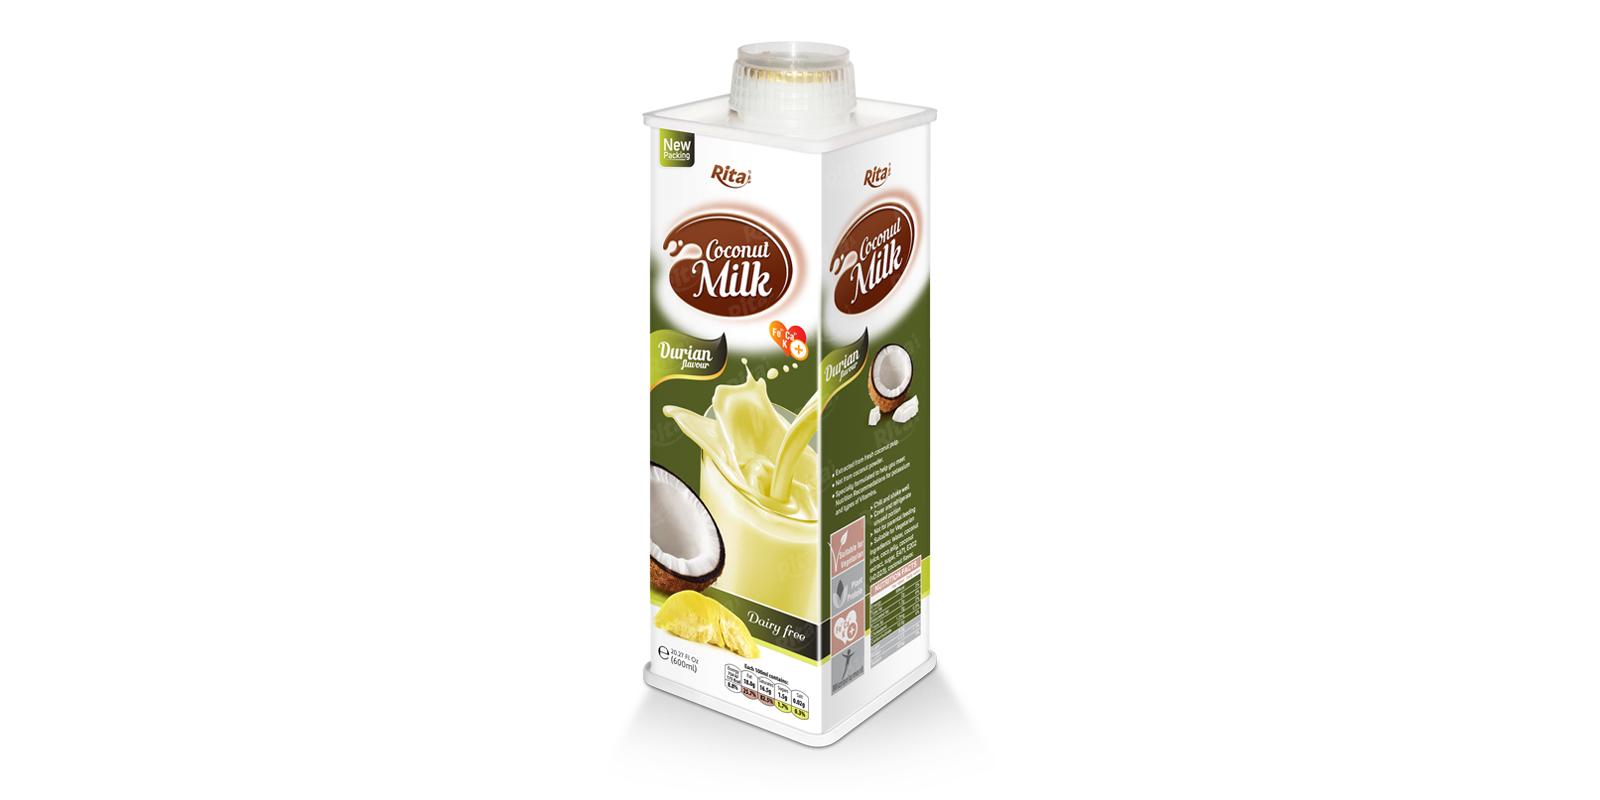 Coconut milk durian 600ml